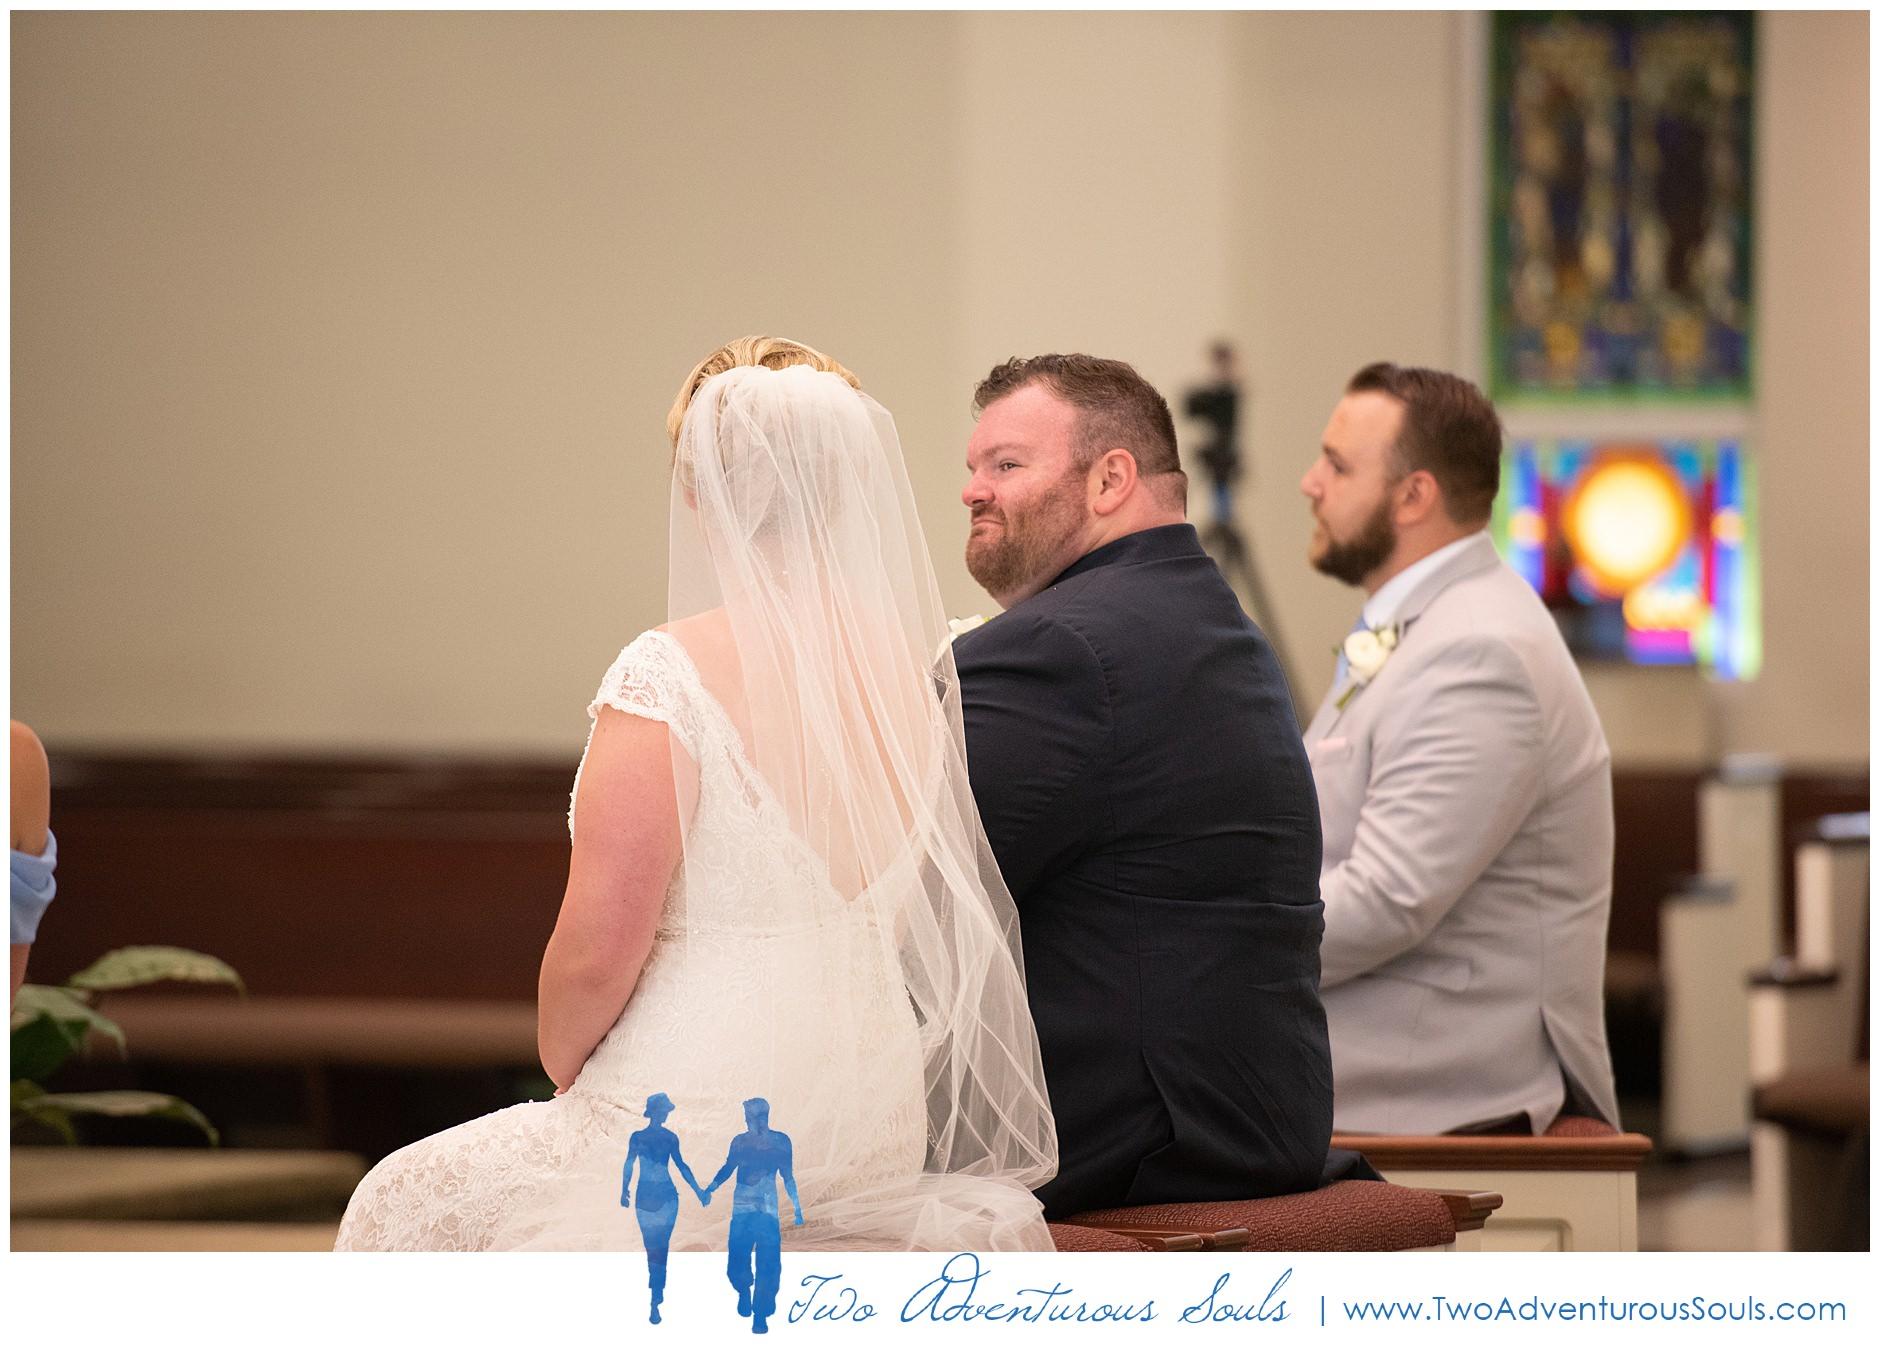 Cape Cod Wedding Photographers, Destination Wedding Photographers, Two Adventurous Souls-081019_0021.jpg